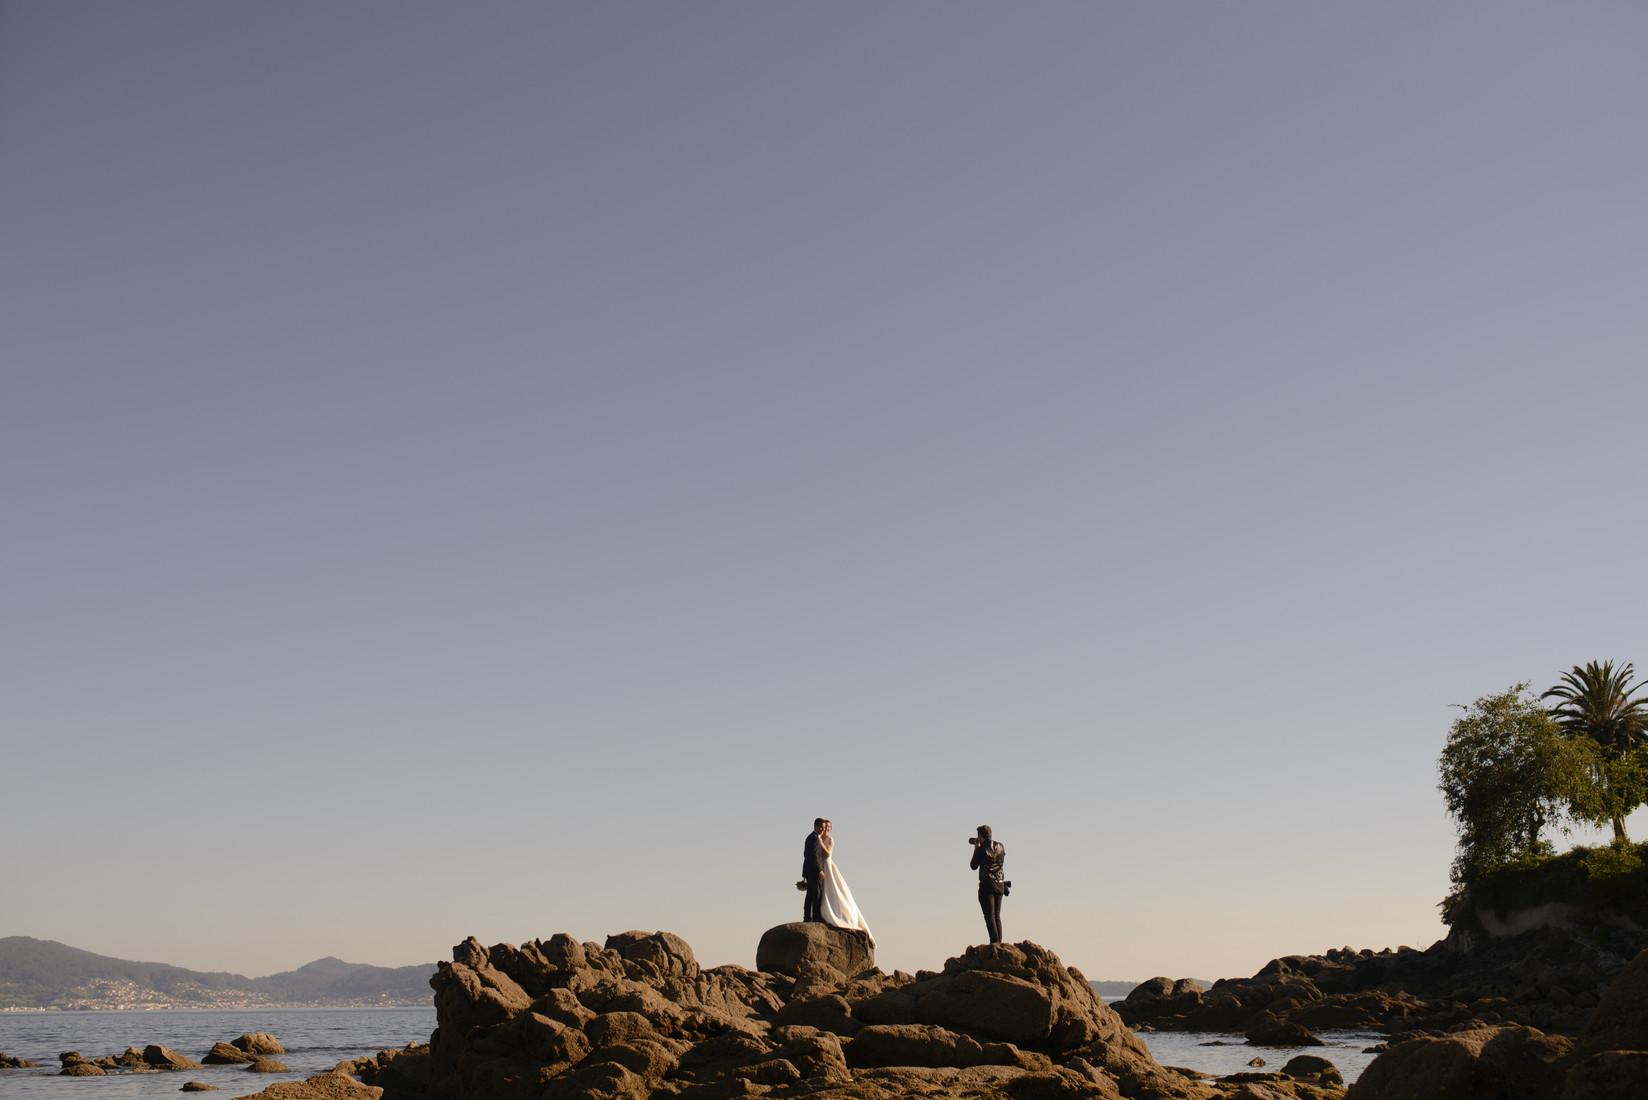 Contate Caio Mayer - Fotógrafo de Casamento, Guarapuava - PR